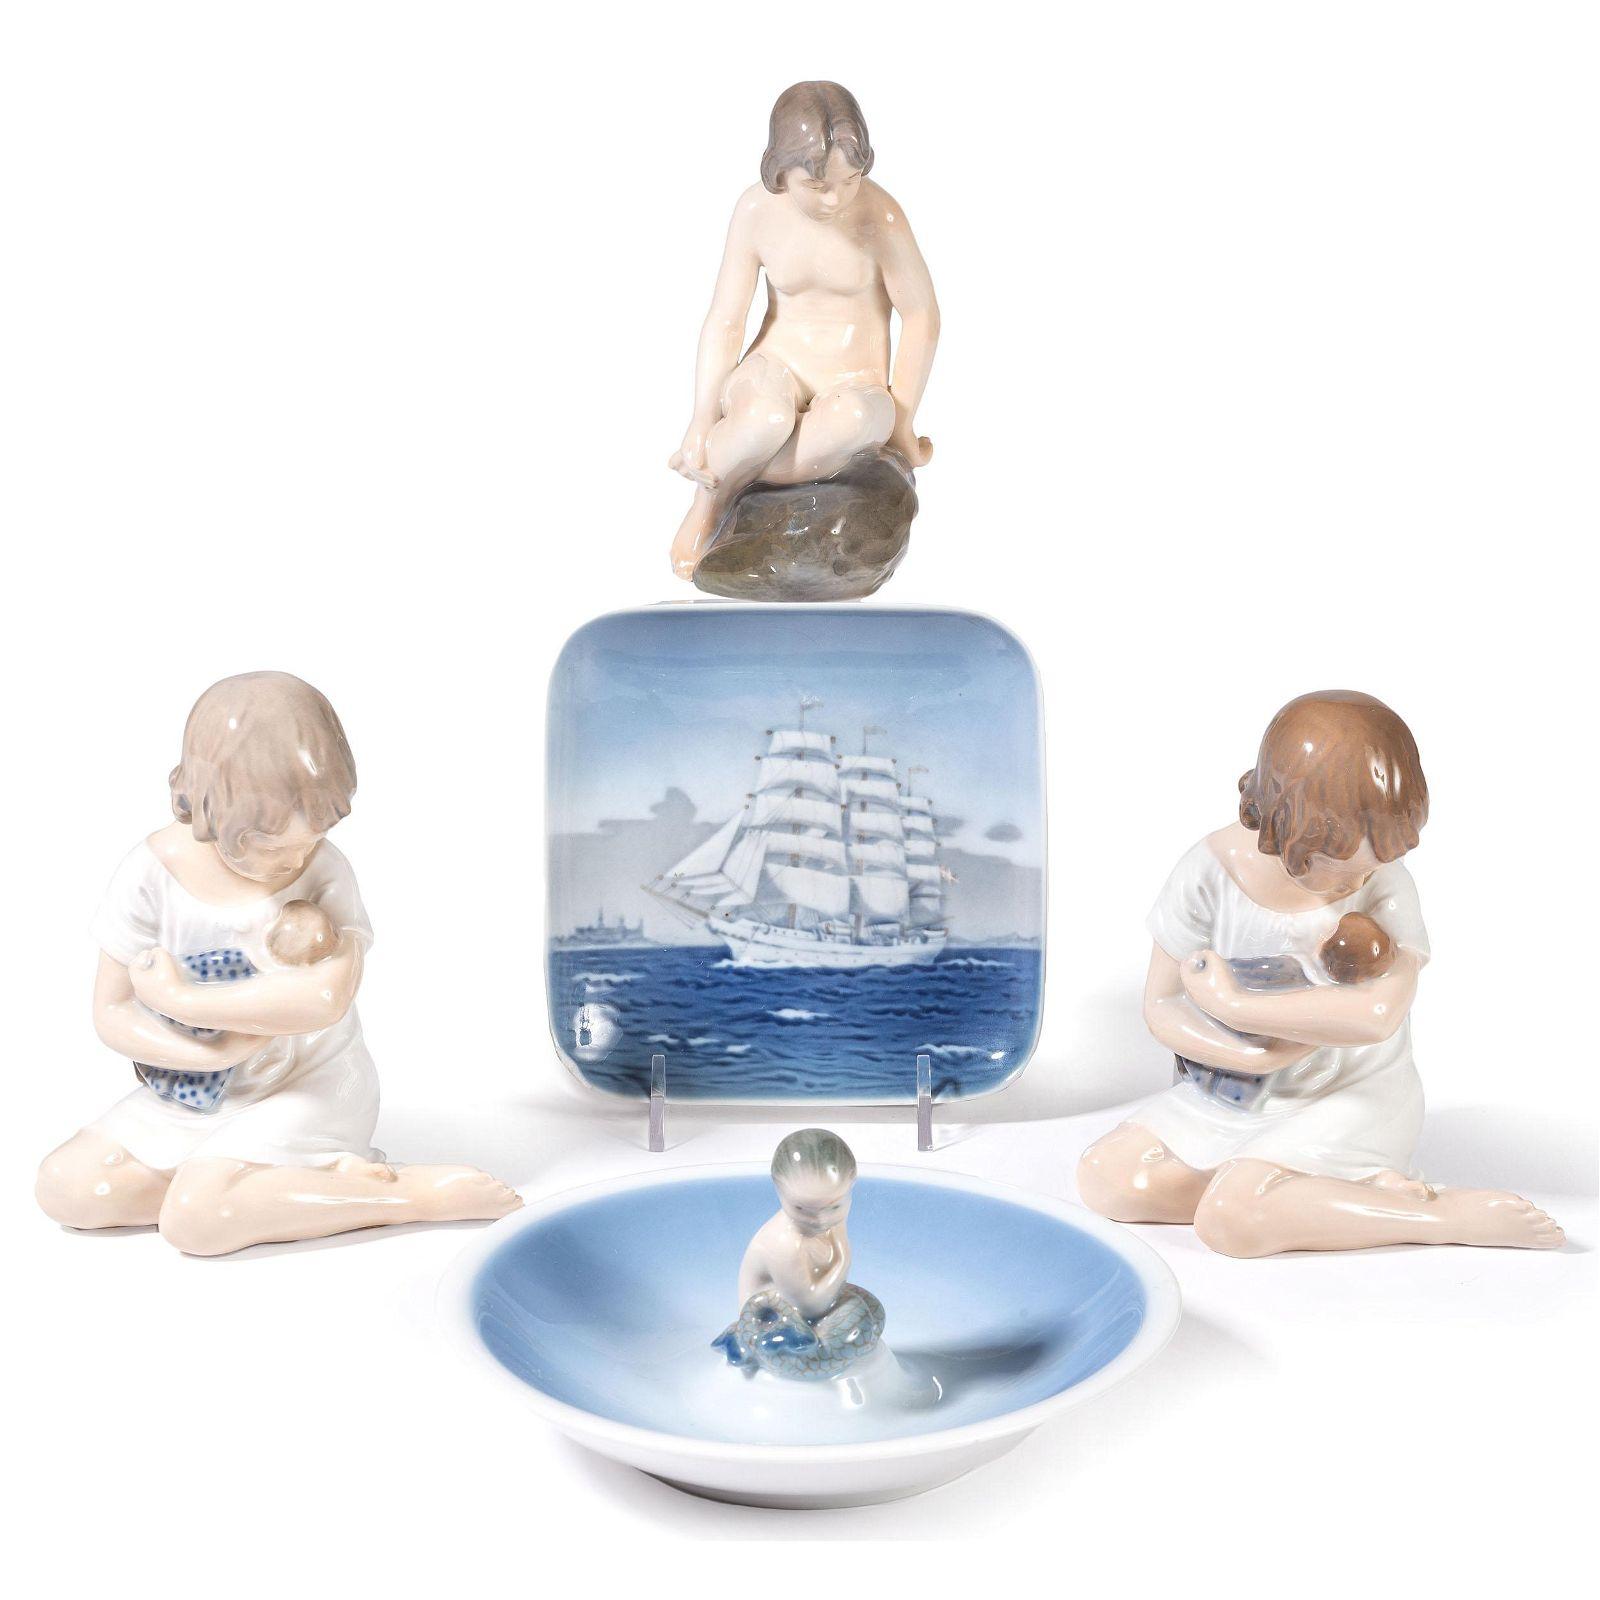 Five Royal Copenhagen Porcelain Figures and Dishes